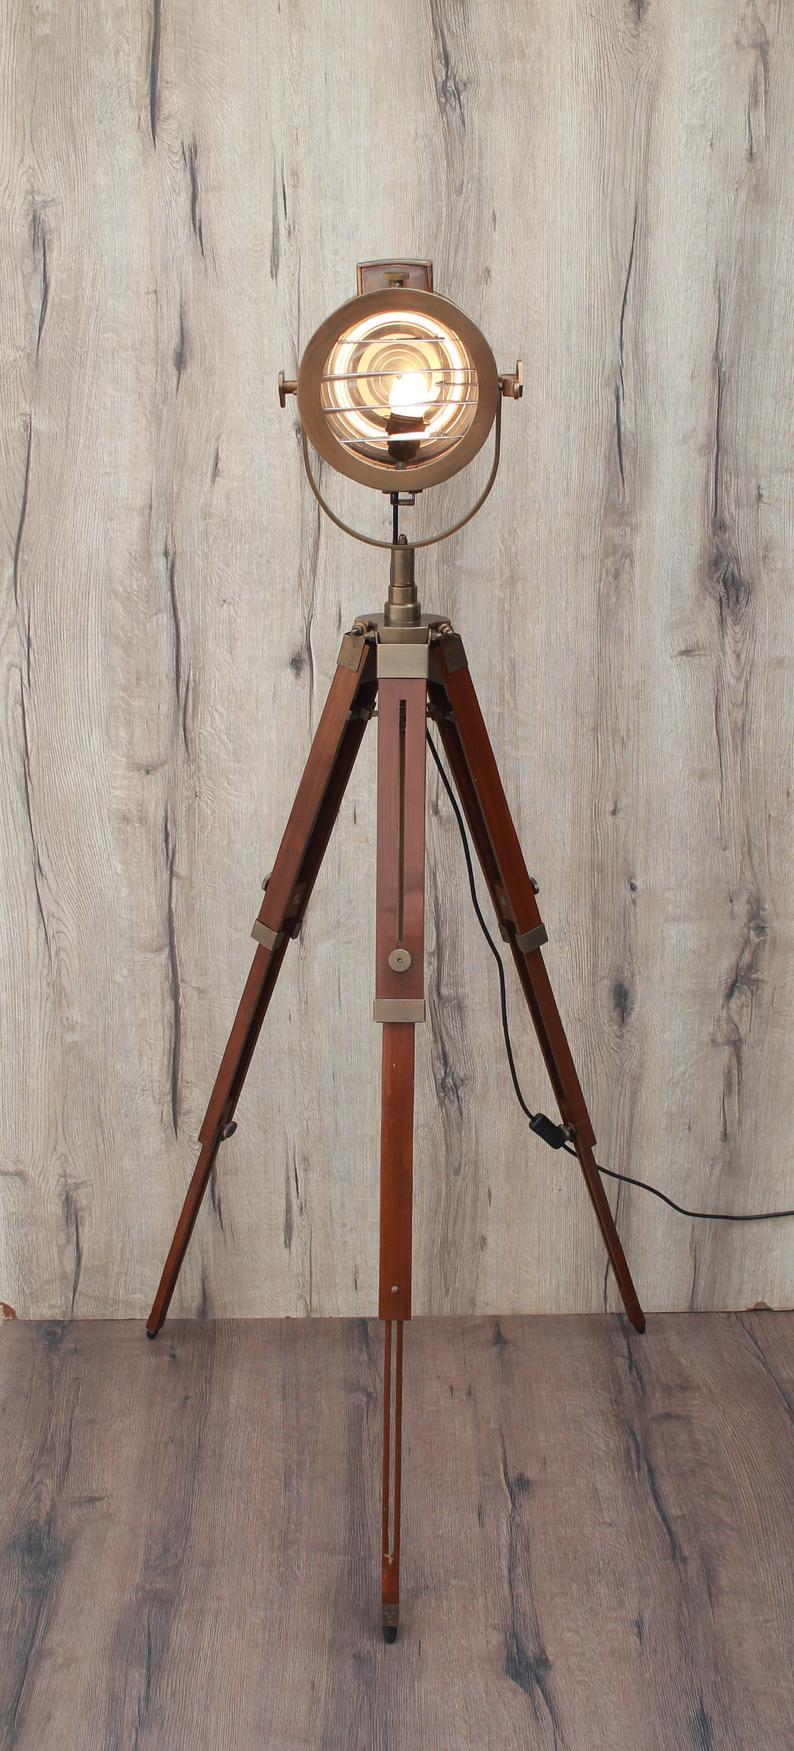 Vintage Antique Brown Shutter Series Adjustable Tripod Floor Etsy In 2020 Vintage Floor Lamp Tripod Floor Lamps Spotlight Floor Lamp